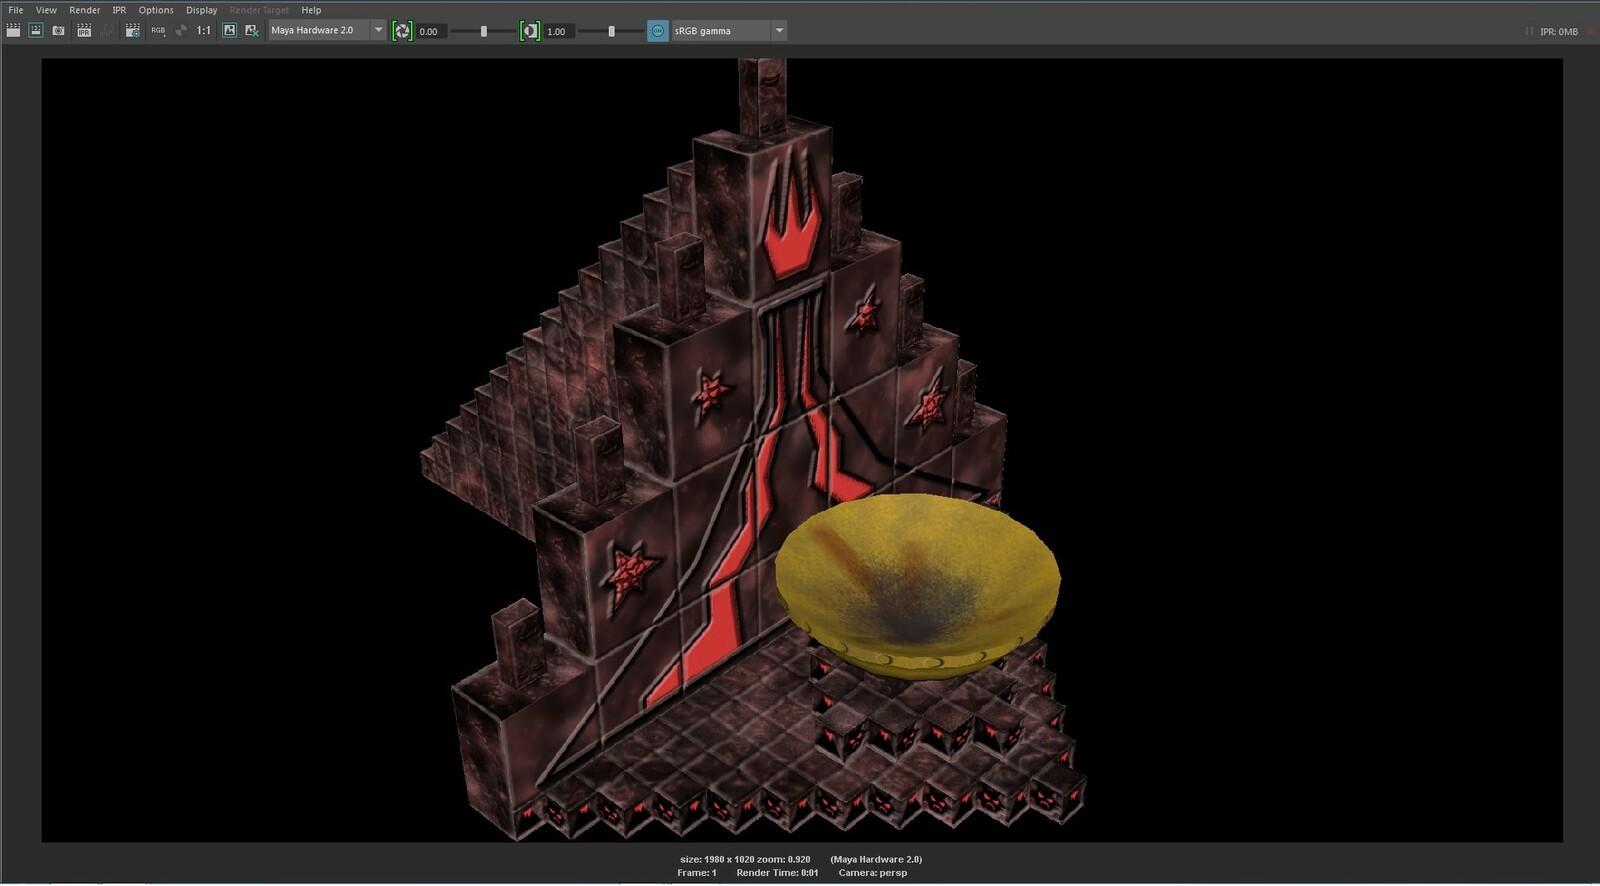 The final 3D model of the Inner Fire Sacrificial Shrine